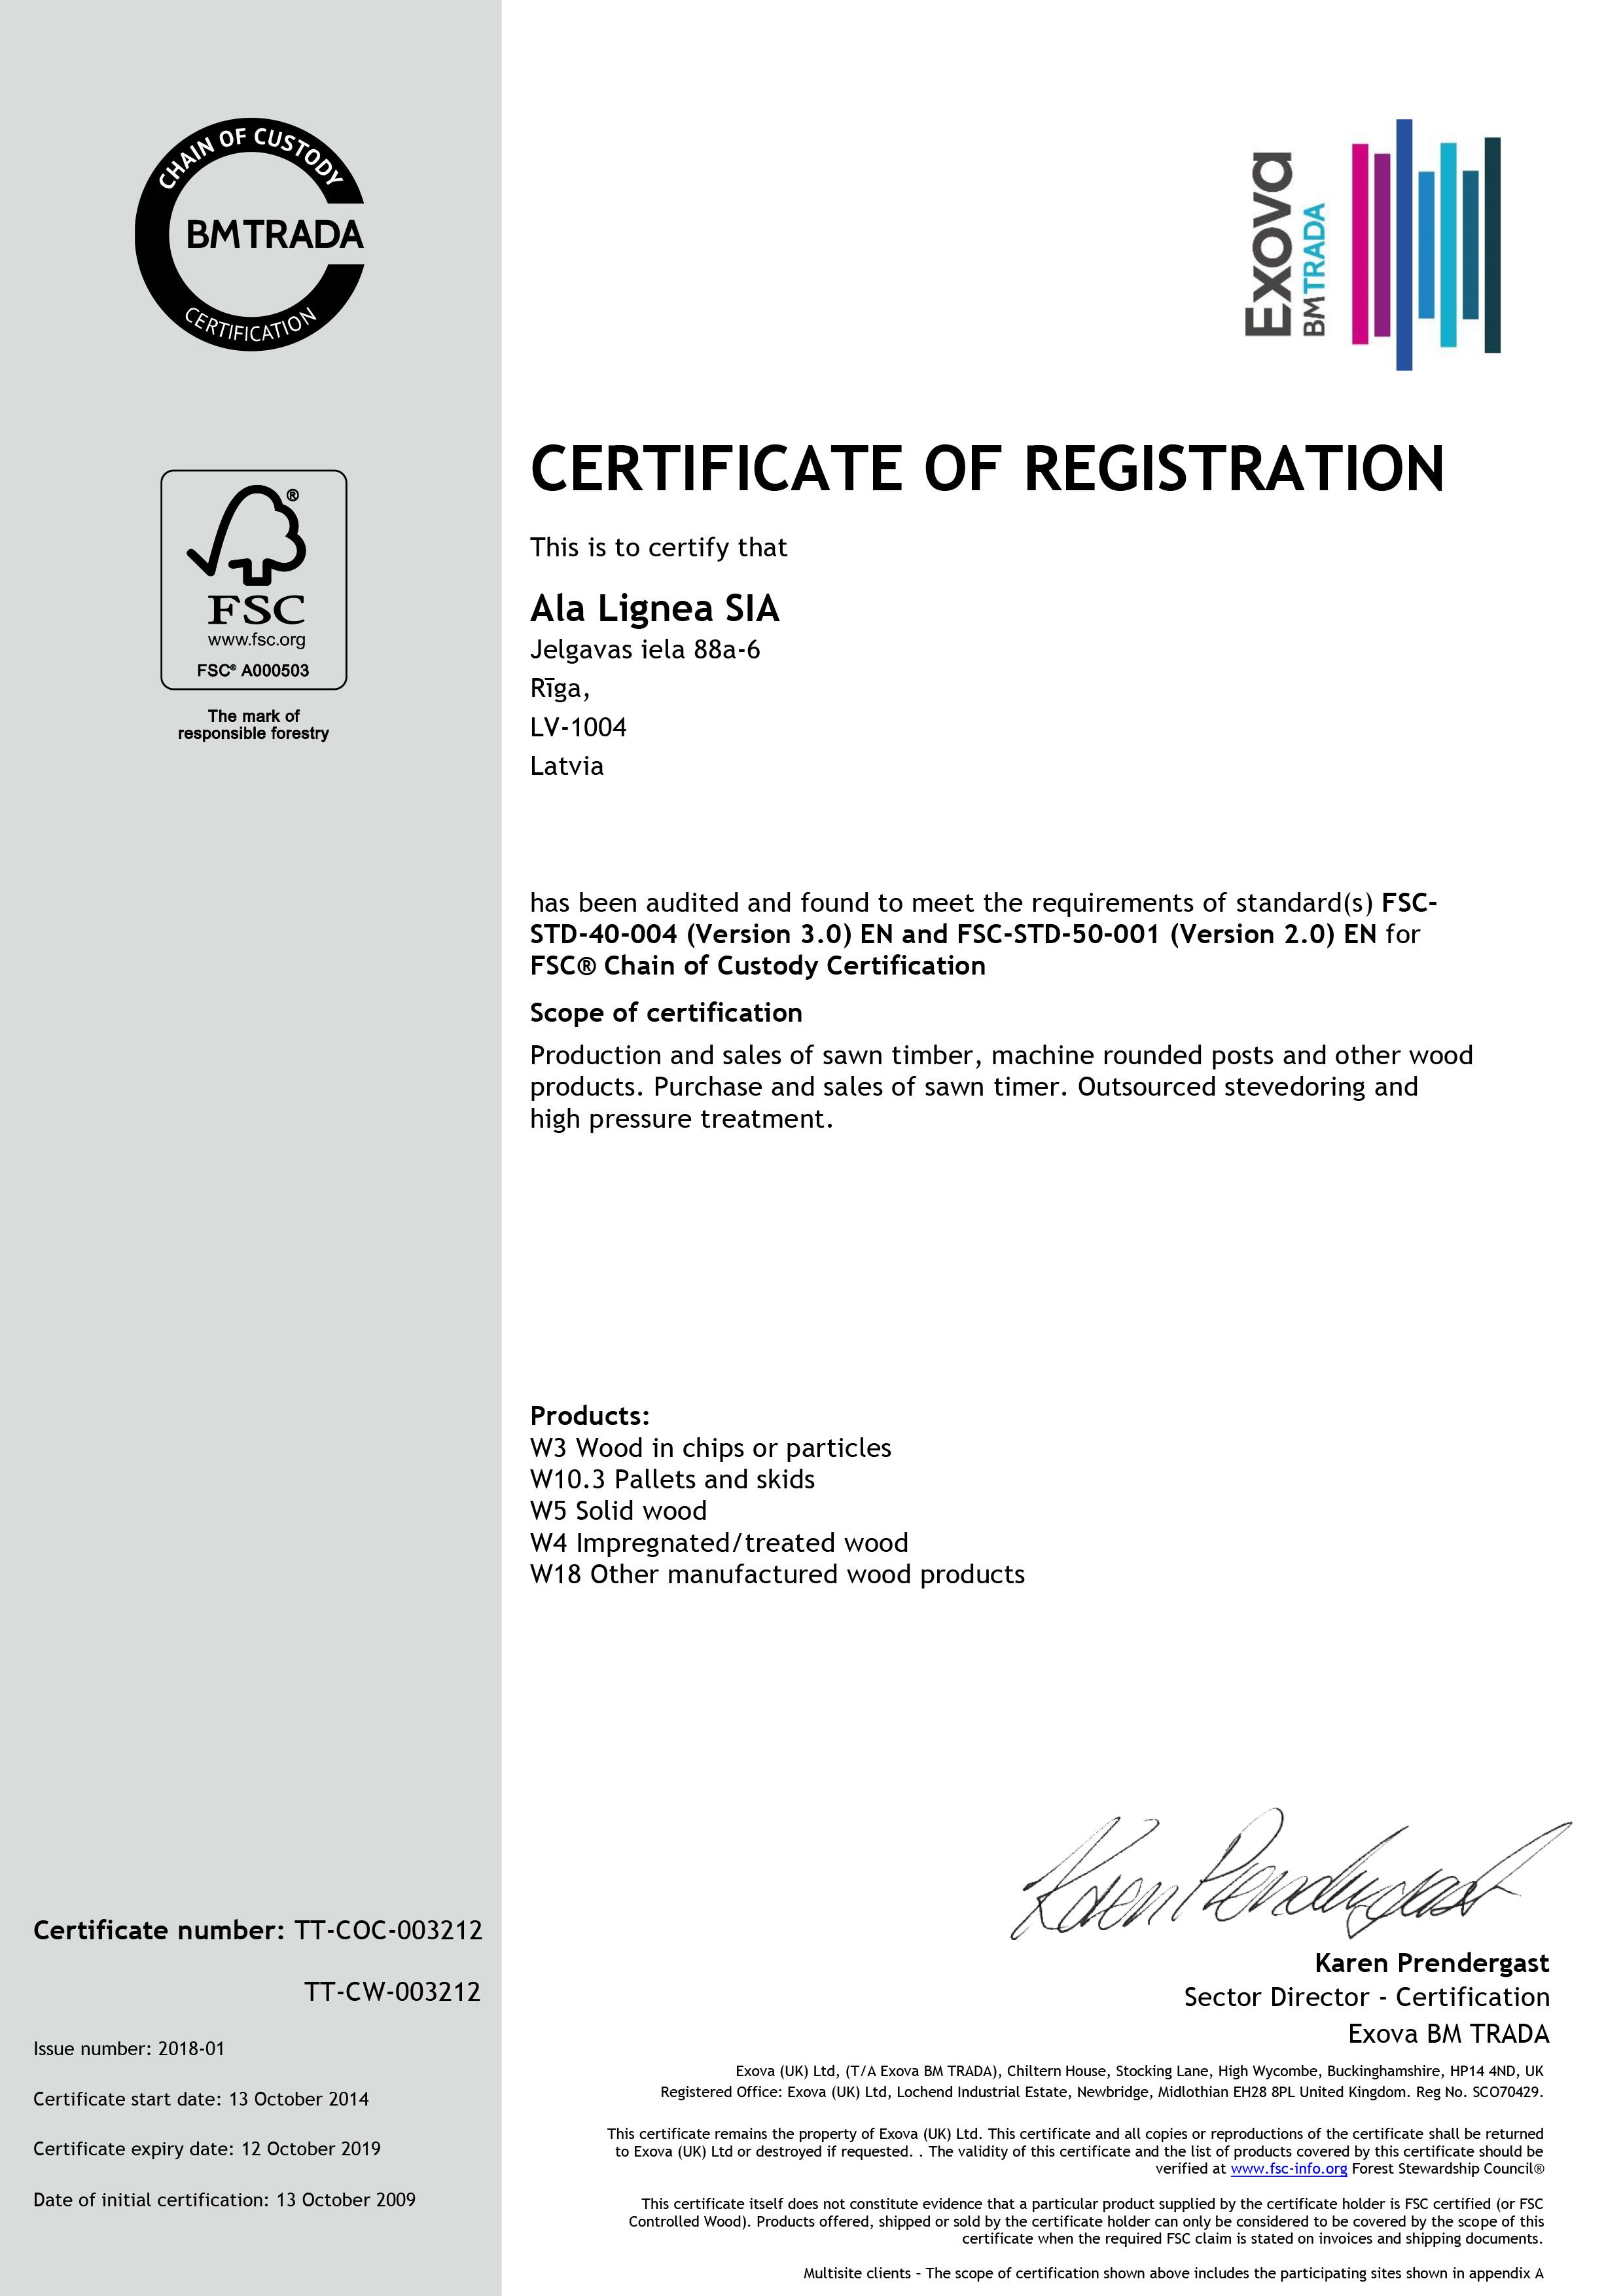 ala-lignea-sfc-sertifikāts